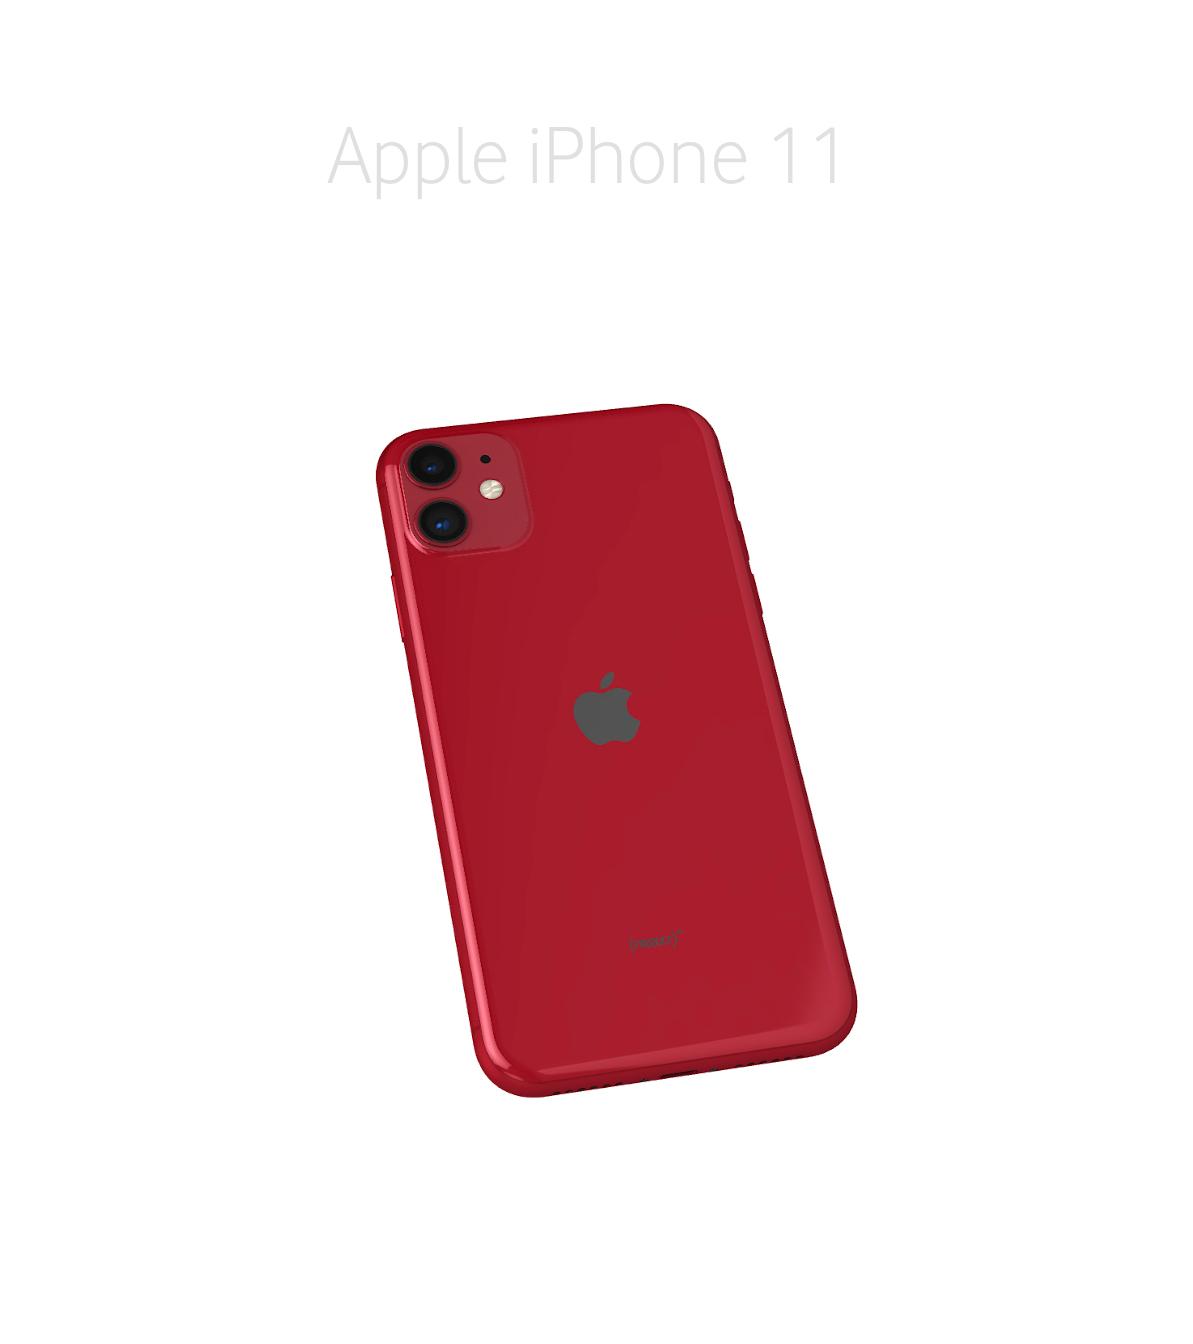 Laga glas/baksida iPhone 11